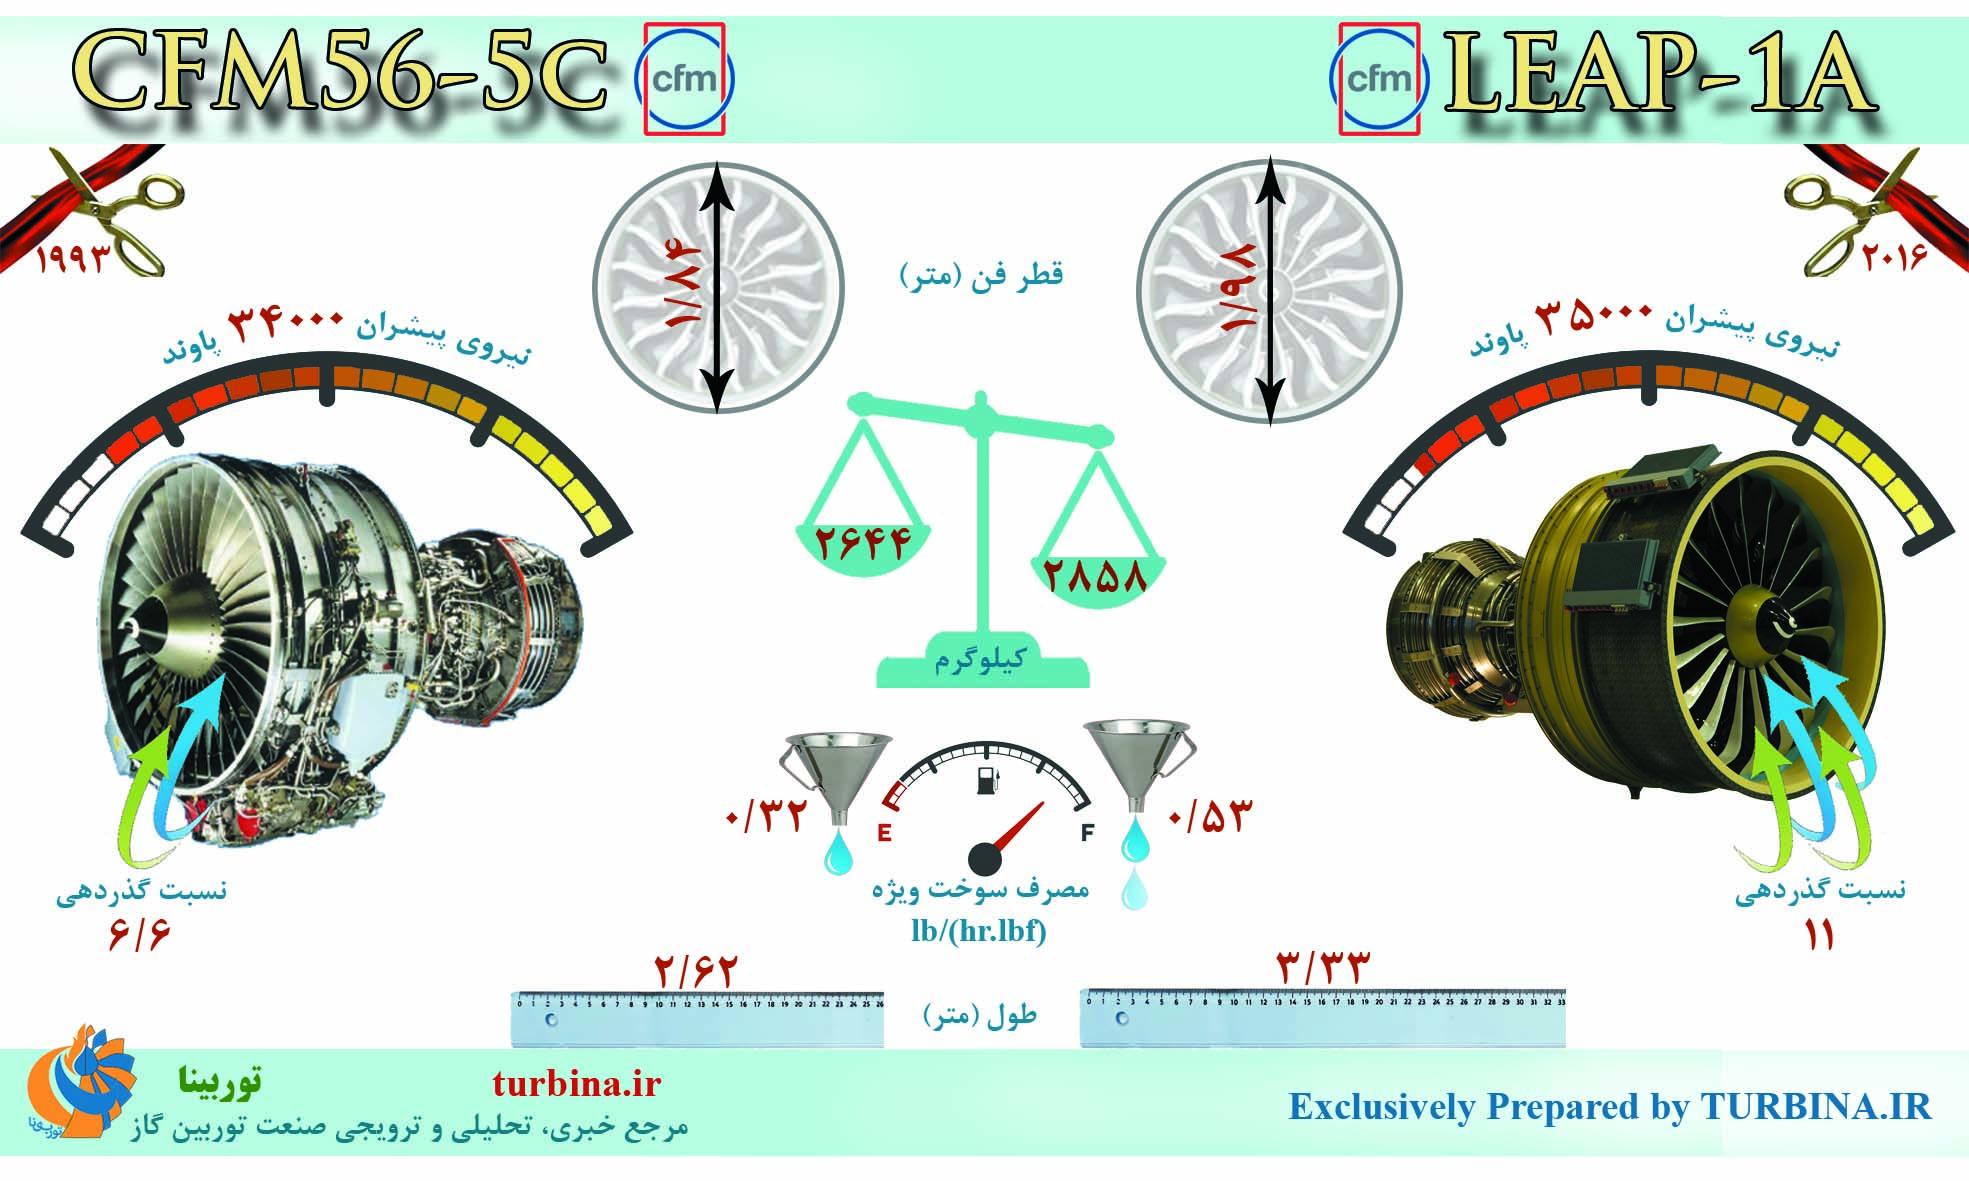 مقایسه موتورهای CFM56-5C و LEAP-1A